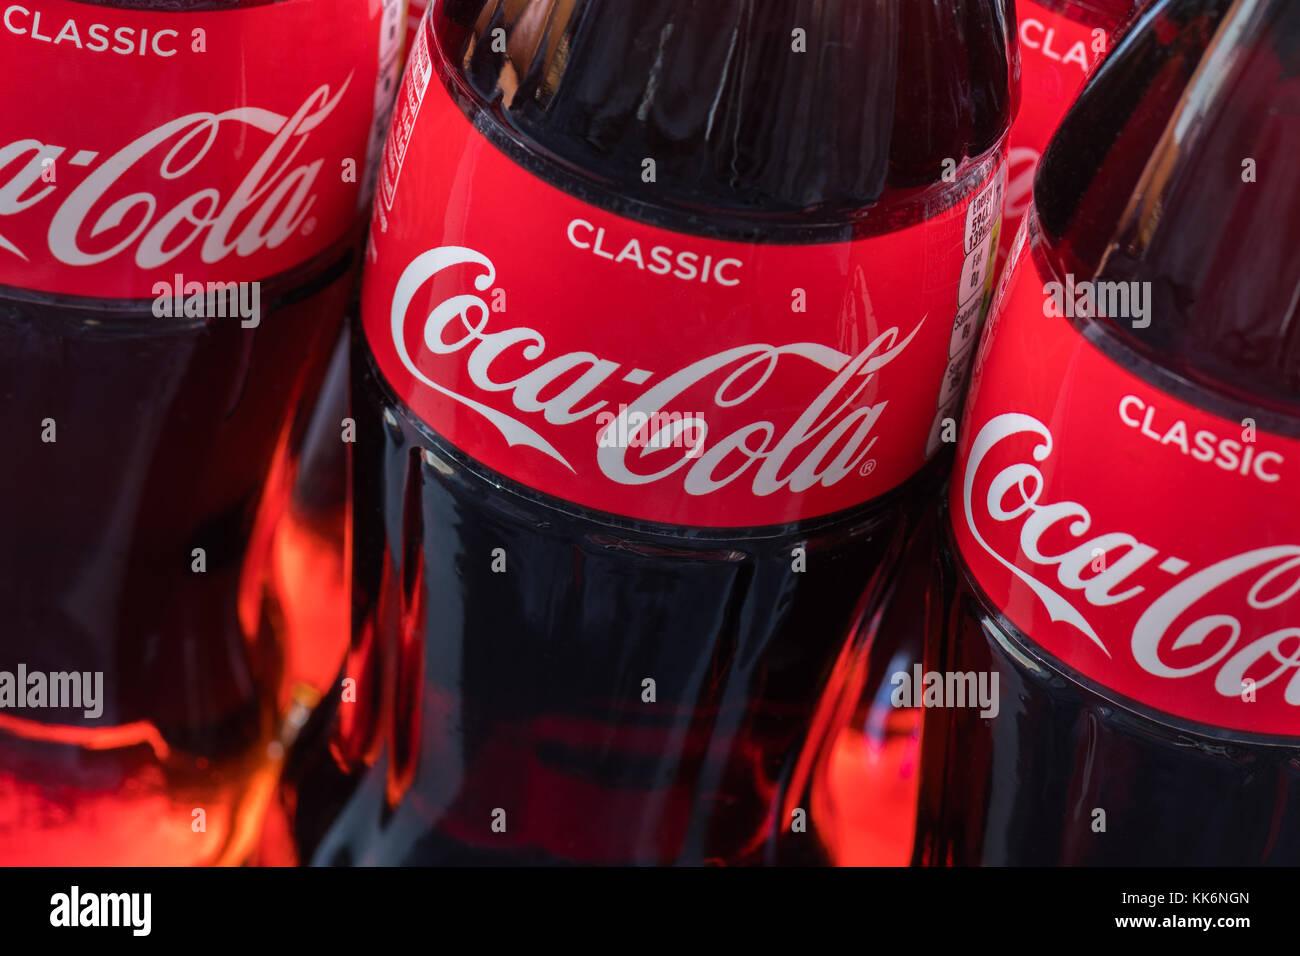 Coca cola Coke bottles - Stock Image